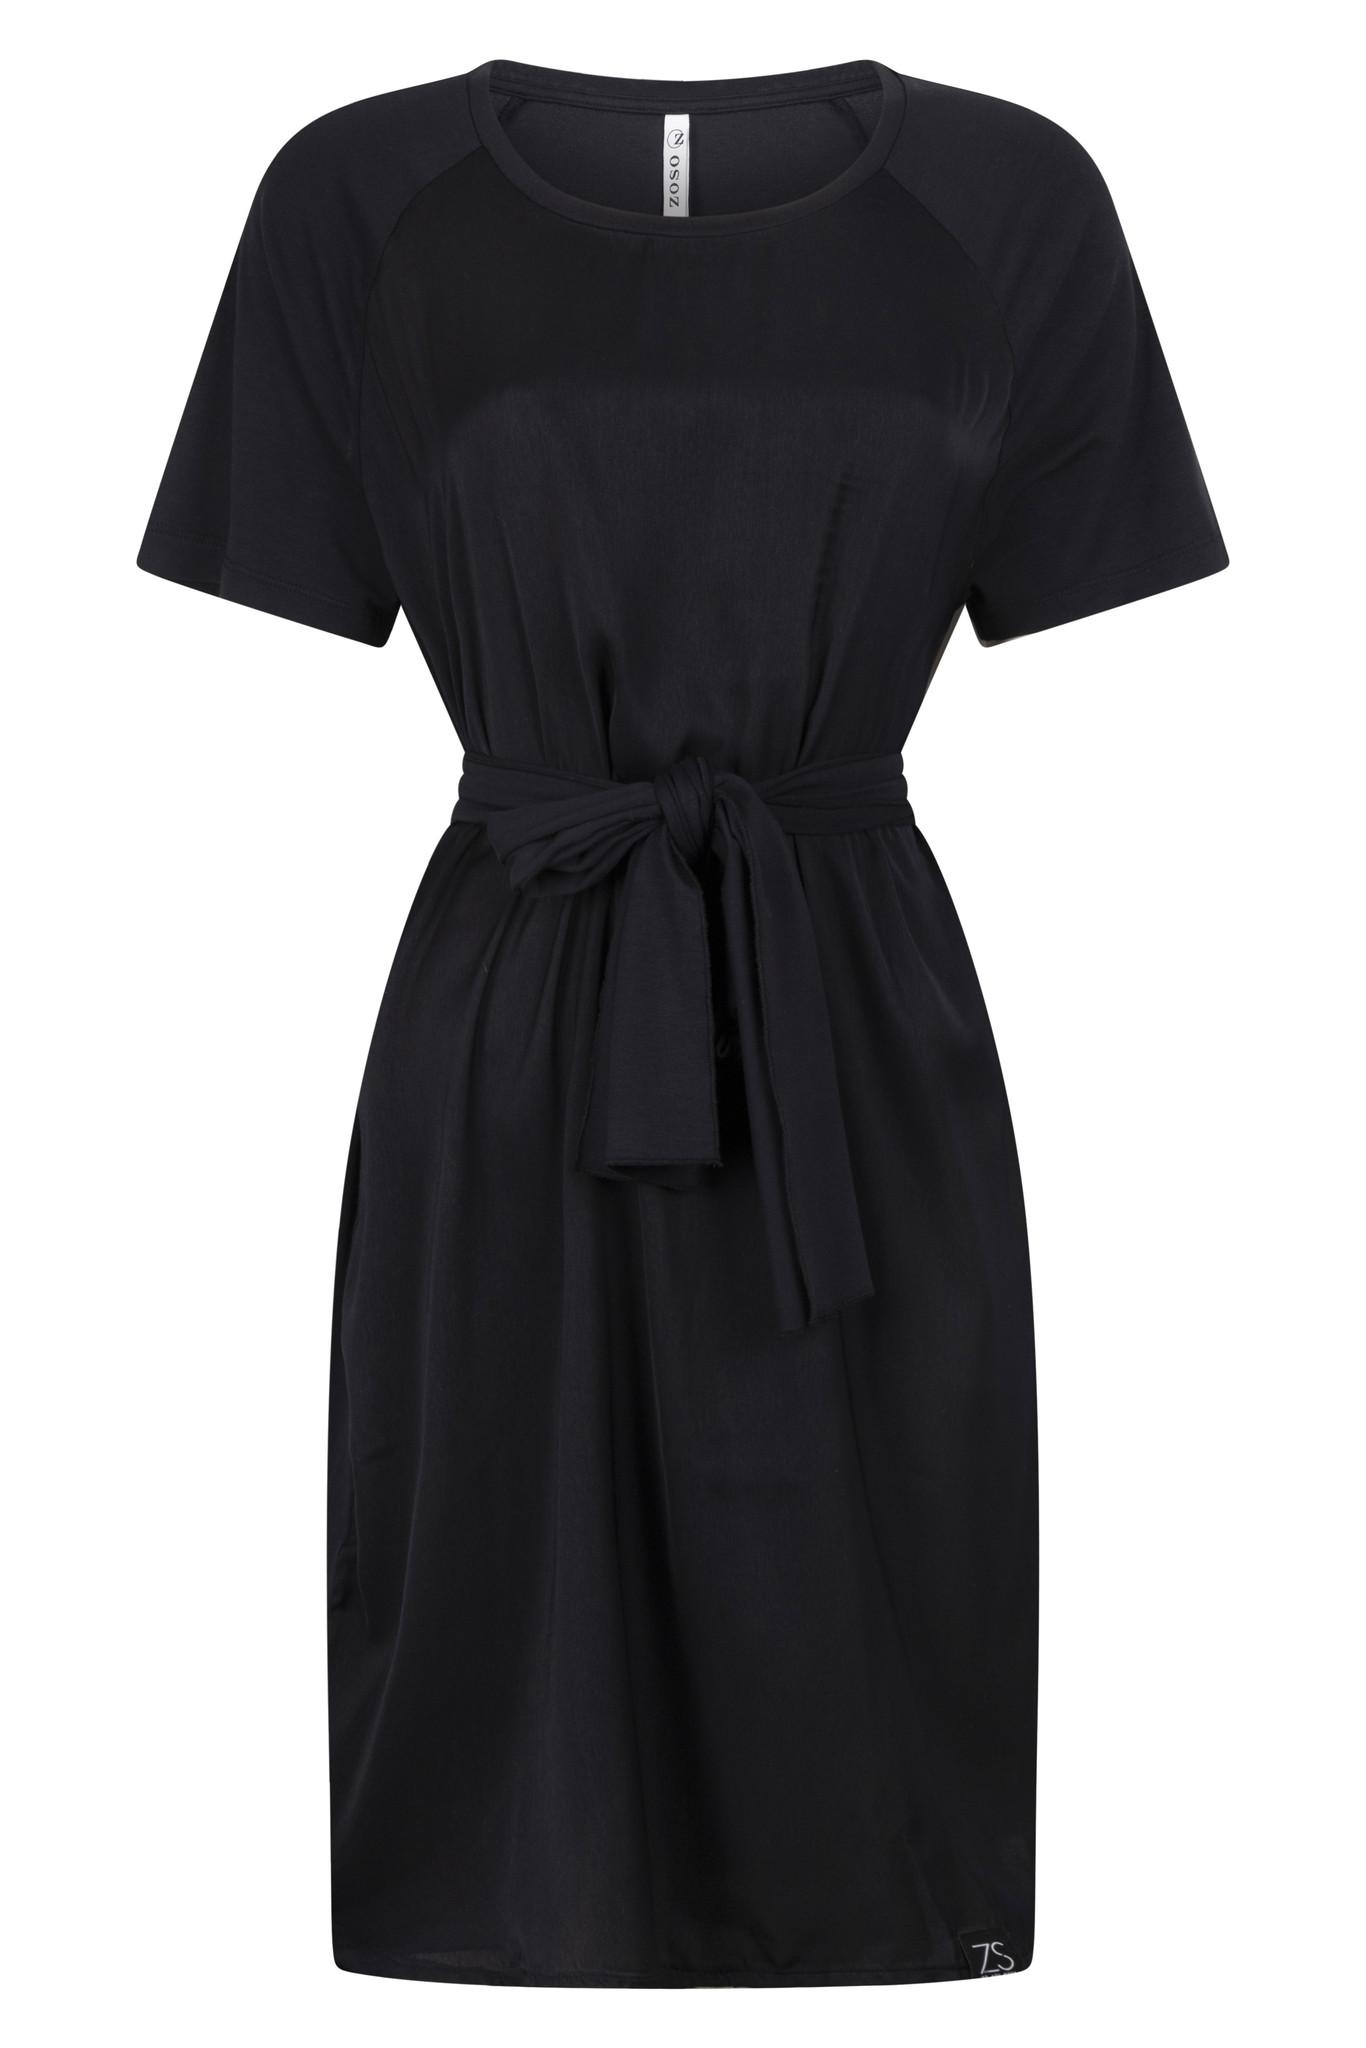 Zoso Zoso Mission mixed fabric  tunic/dress navy